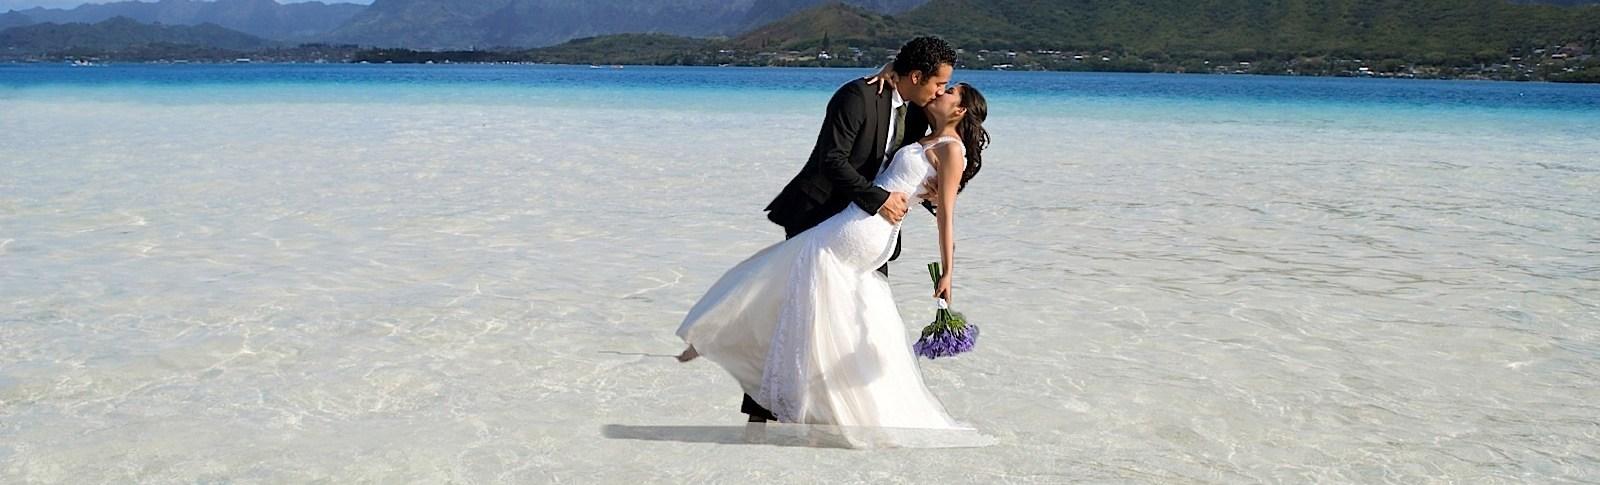 Paradise Bay Resort Hawaii Wedding Venue